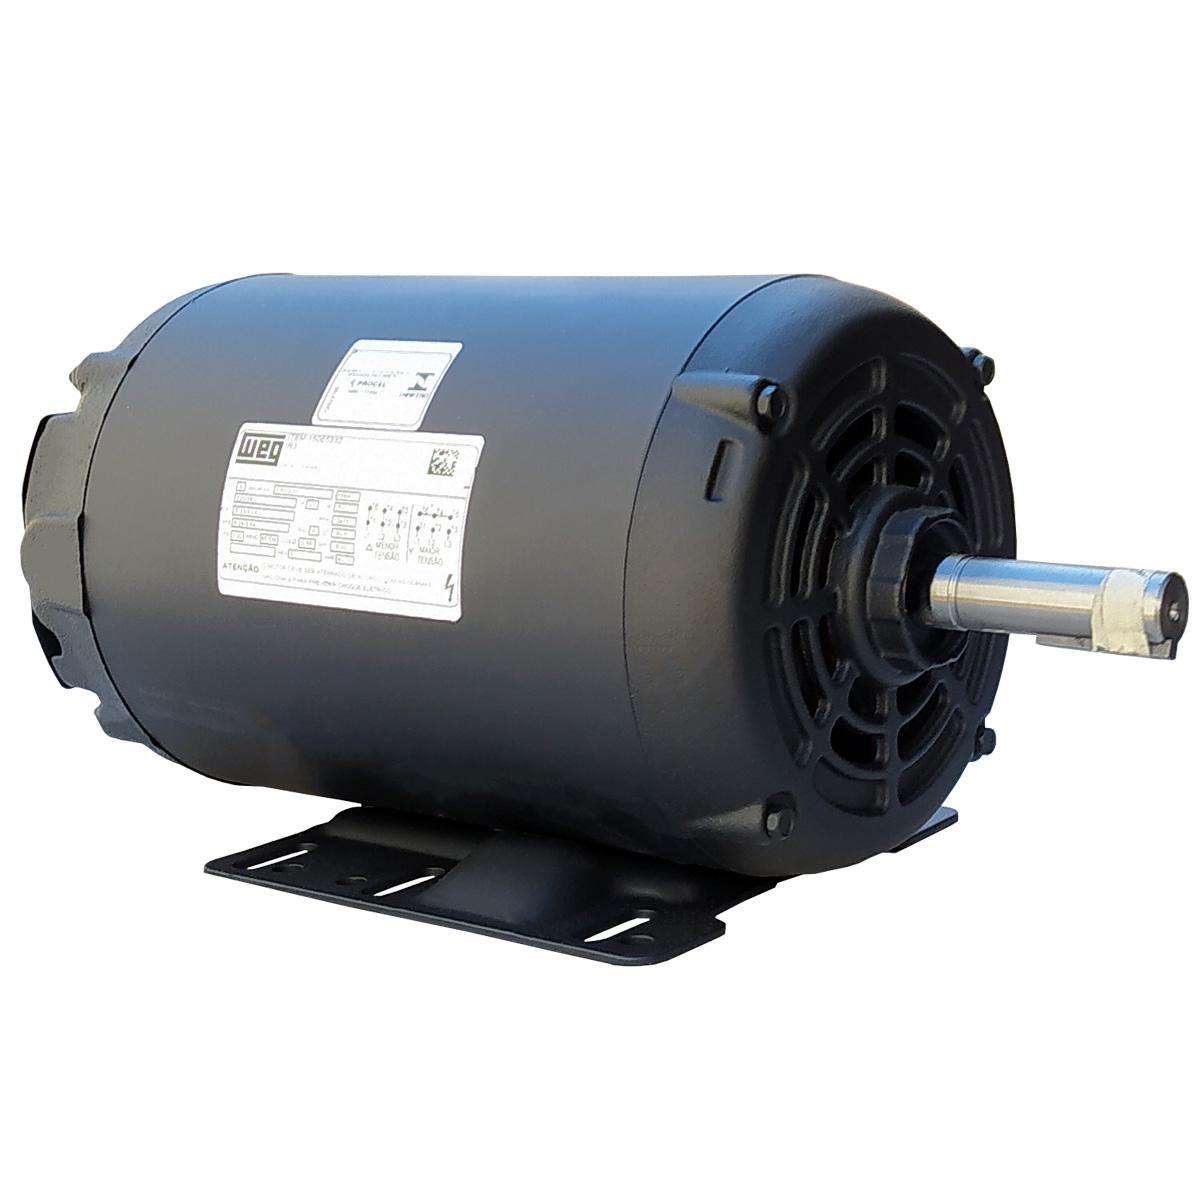 Motor Elétrico Trifásico 2CV 4 Polos Baixa Rotação 220/380v Aberto IP21 Weg IR3